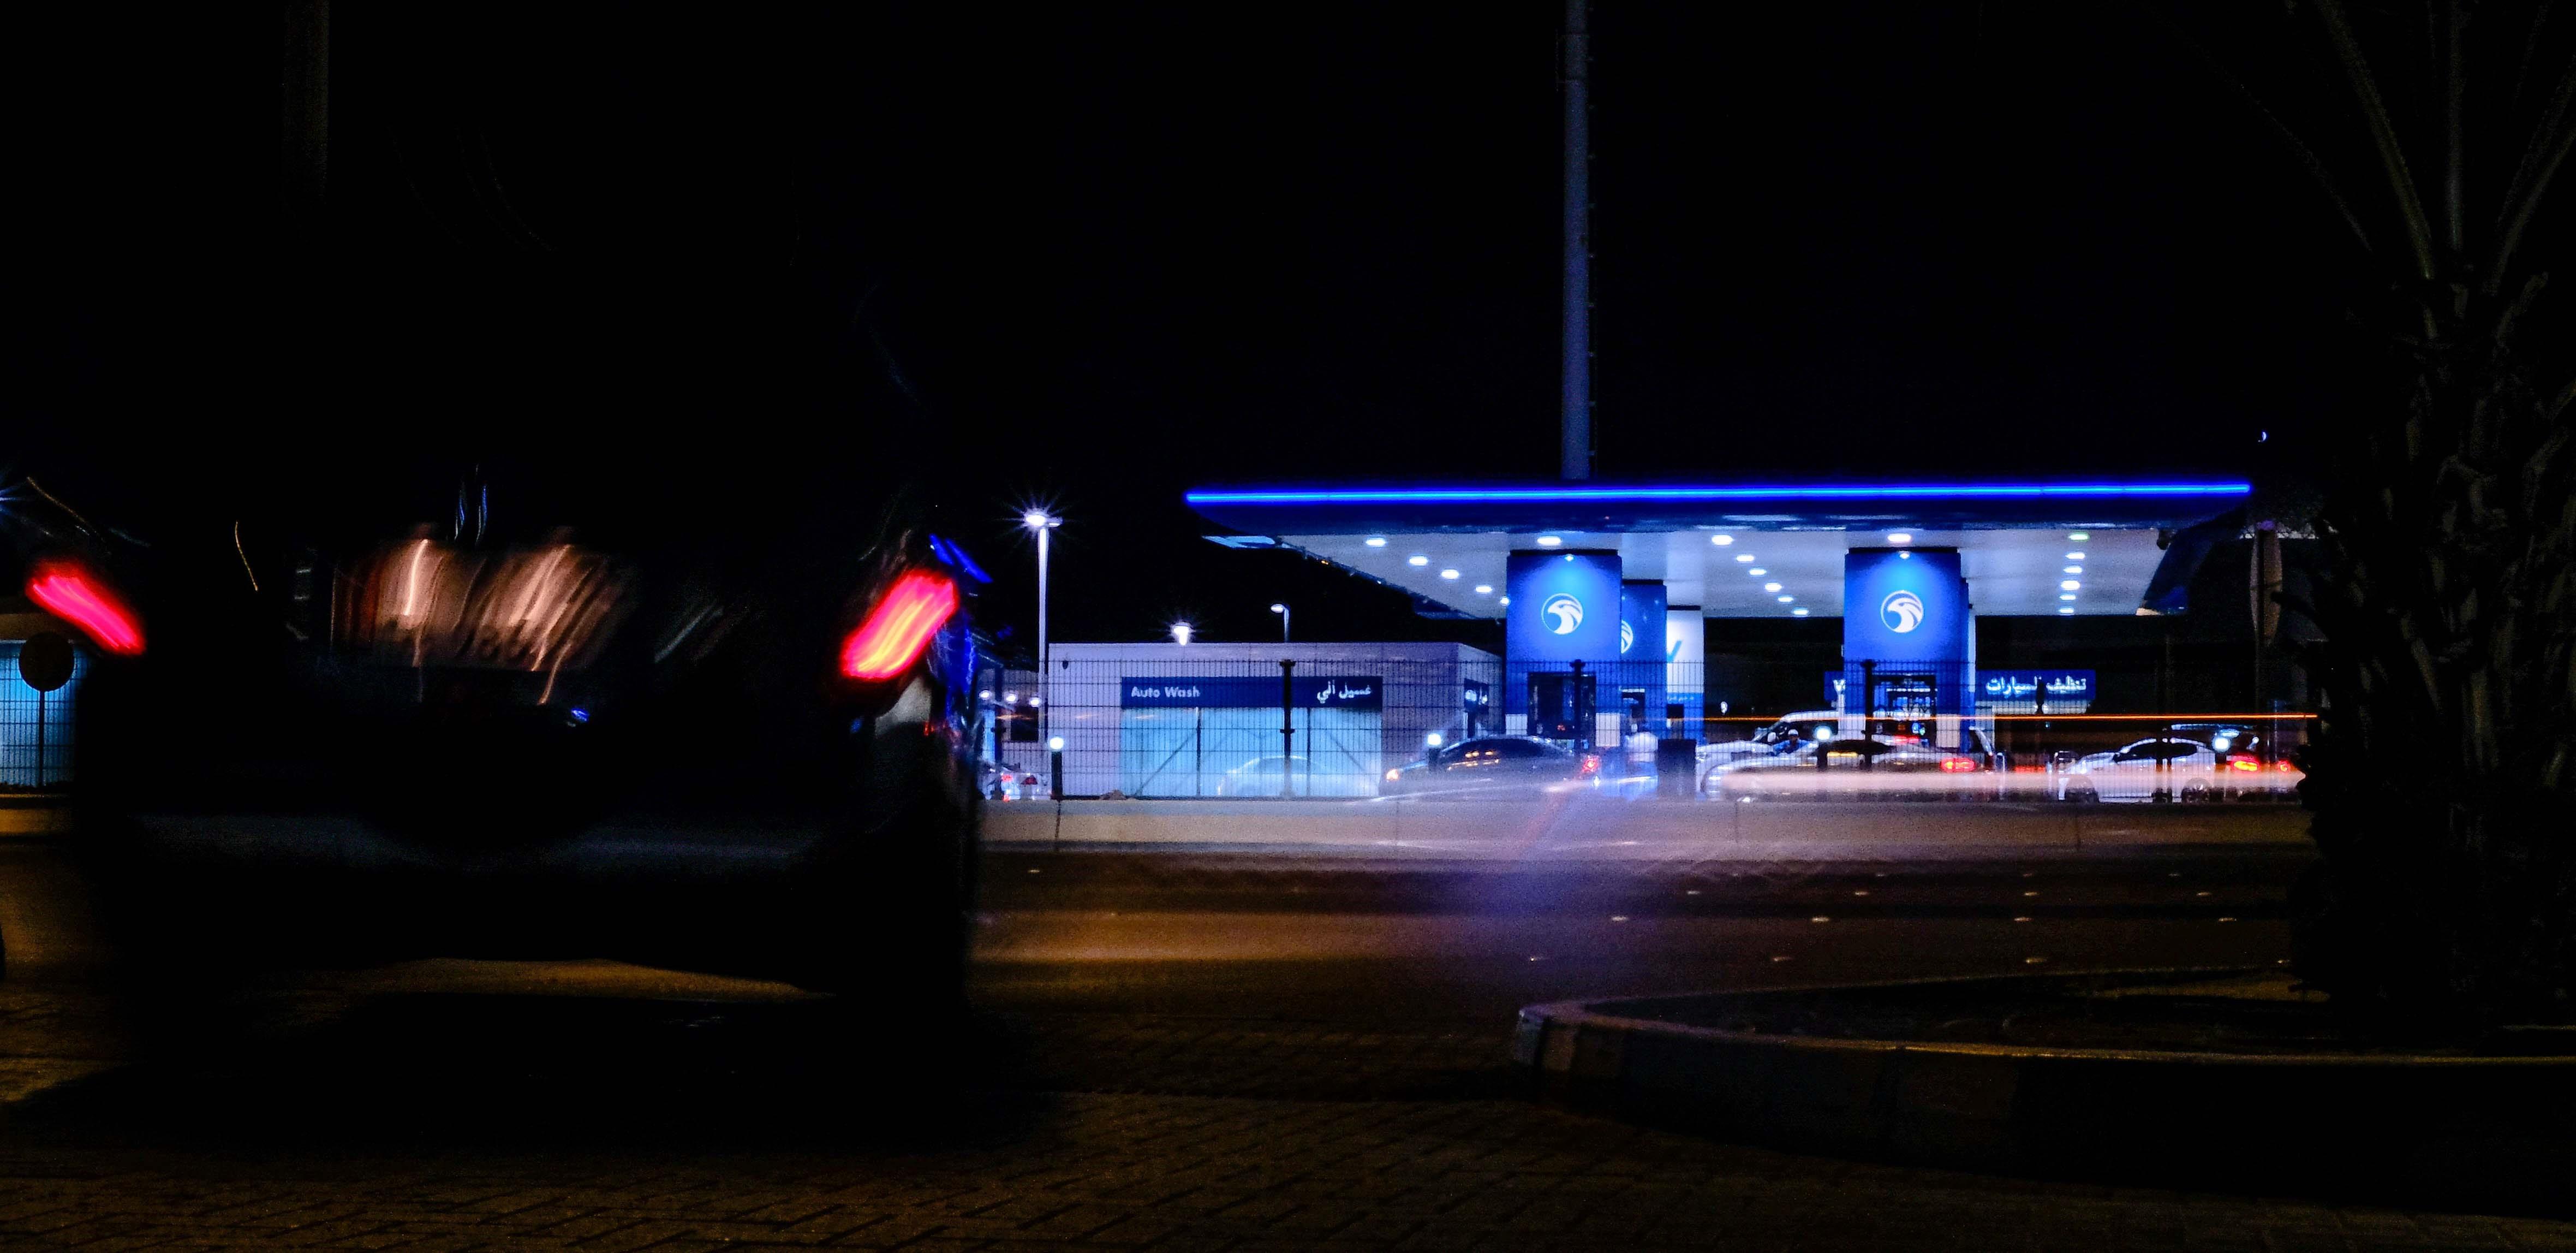 Adnoc fuel station lit up at night